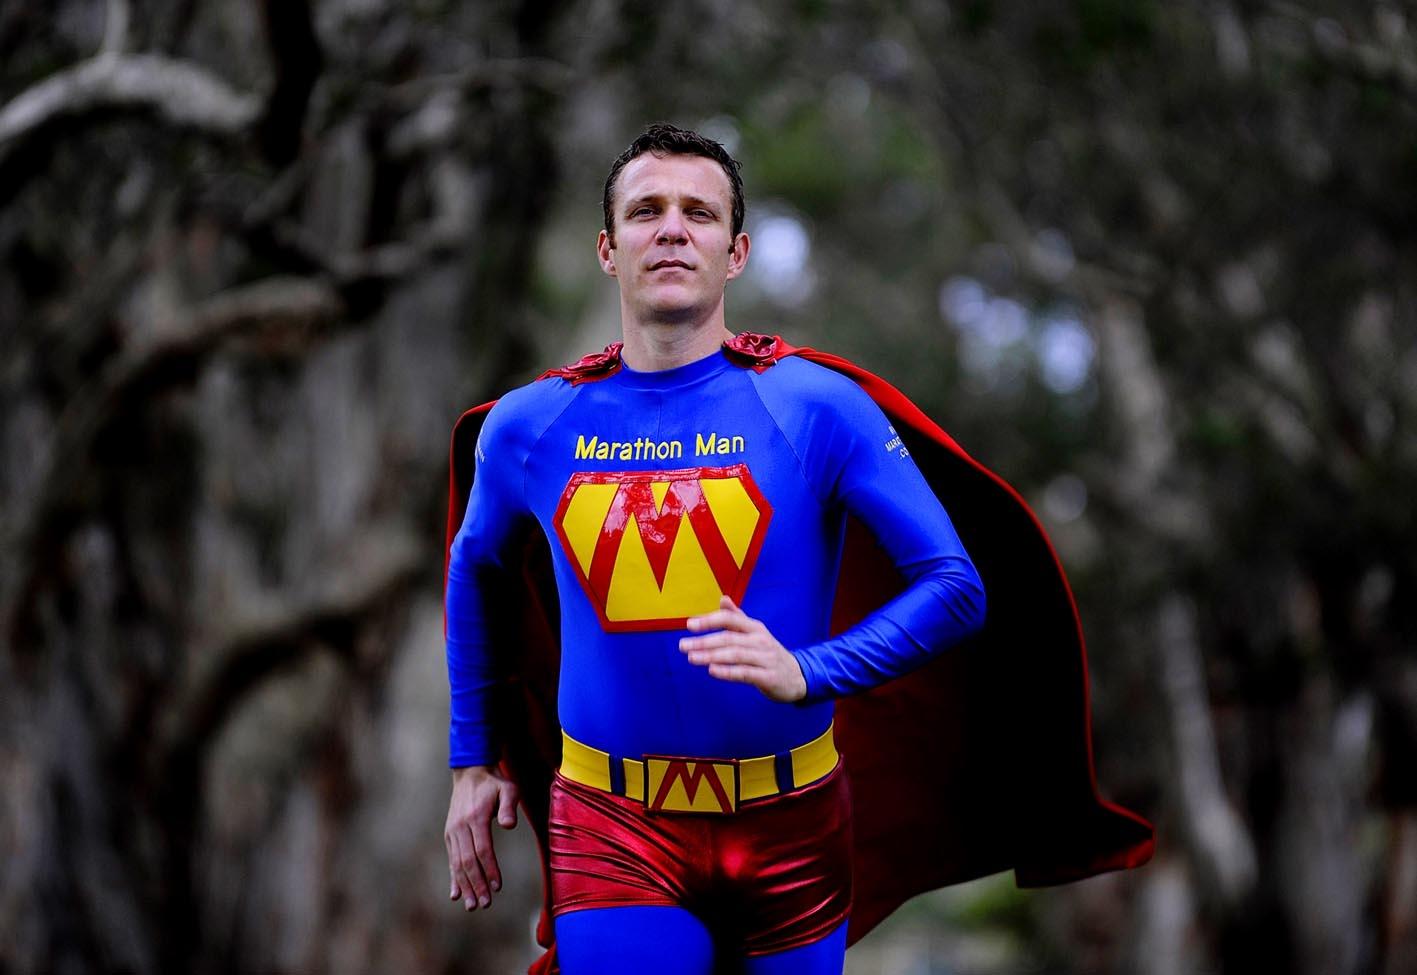 training for my 4th half marathon: why this one will be ... |Marathon Man Running